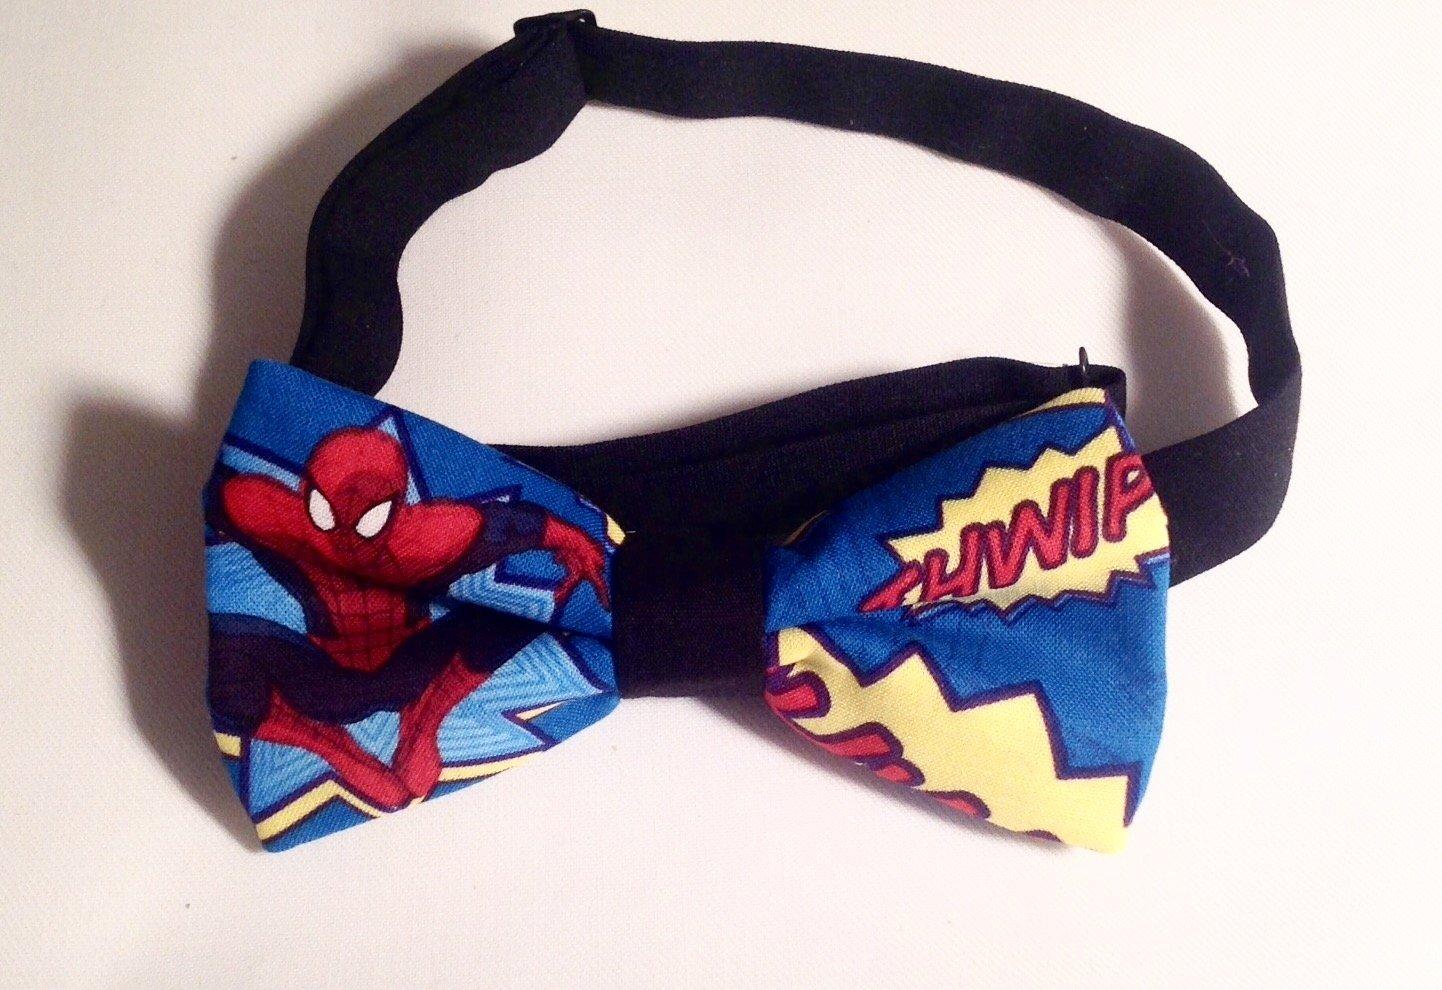 Bow tie men spiderman comic neckband cotton pretied superhero